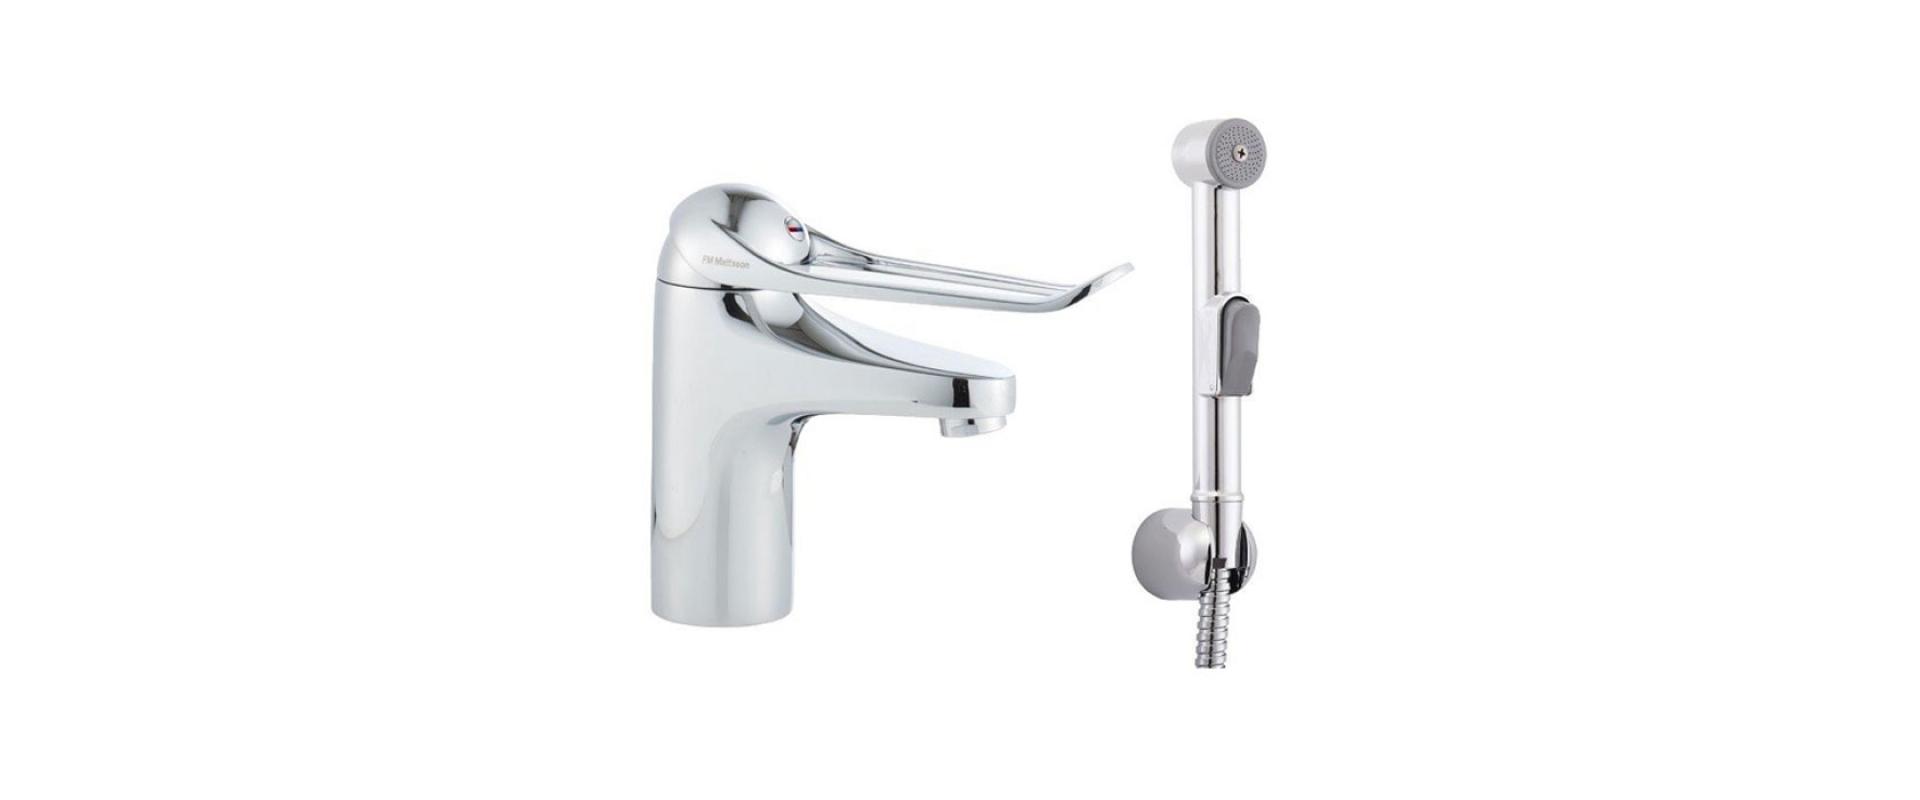 Tvättställsblandare 425-106